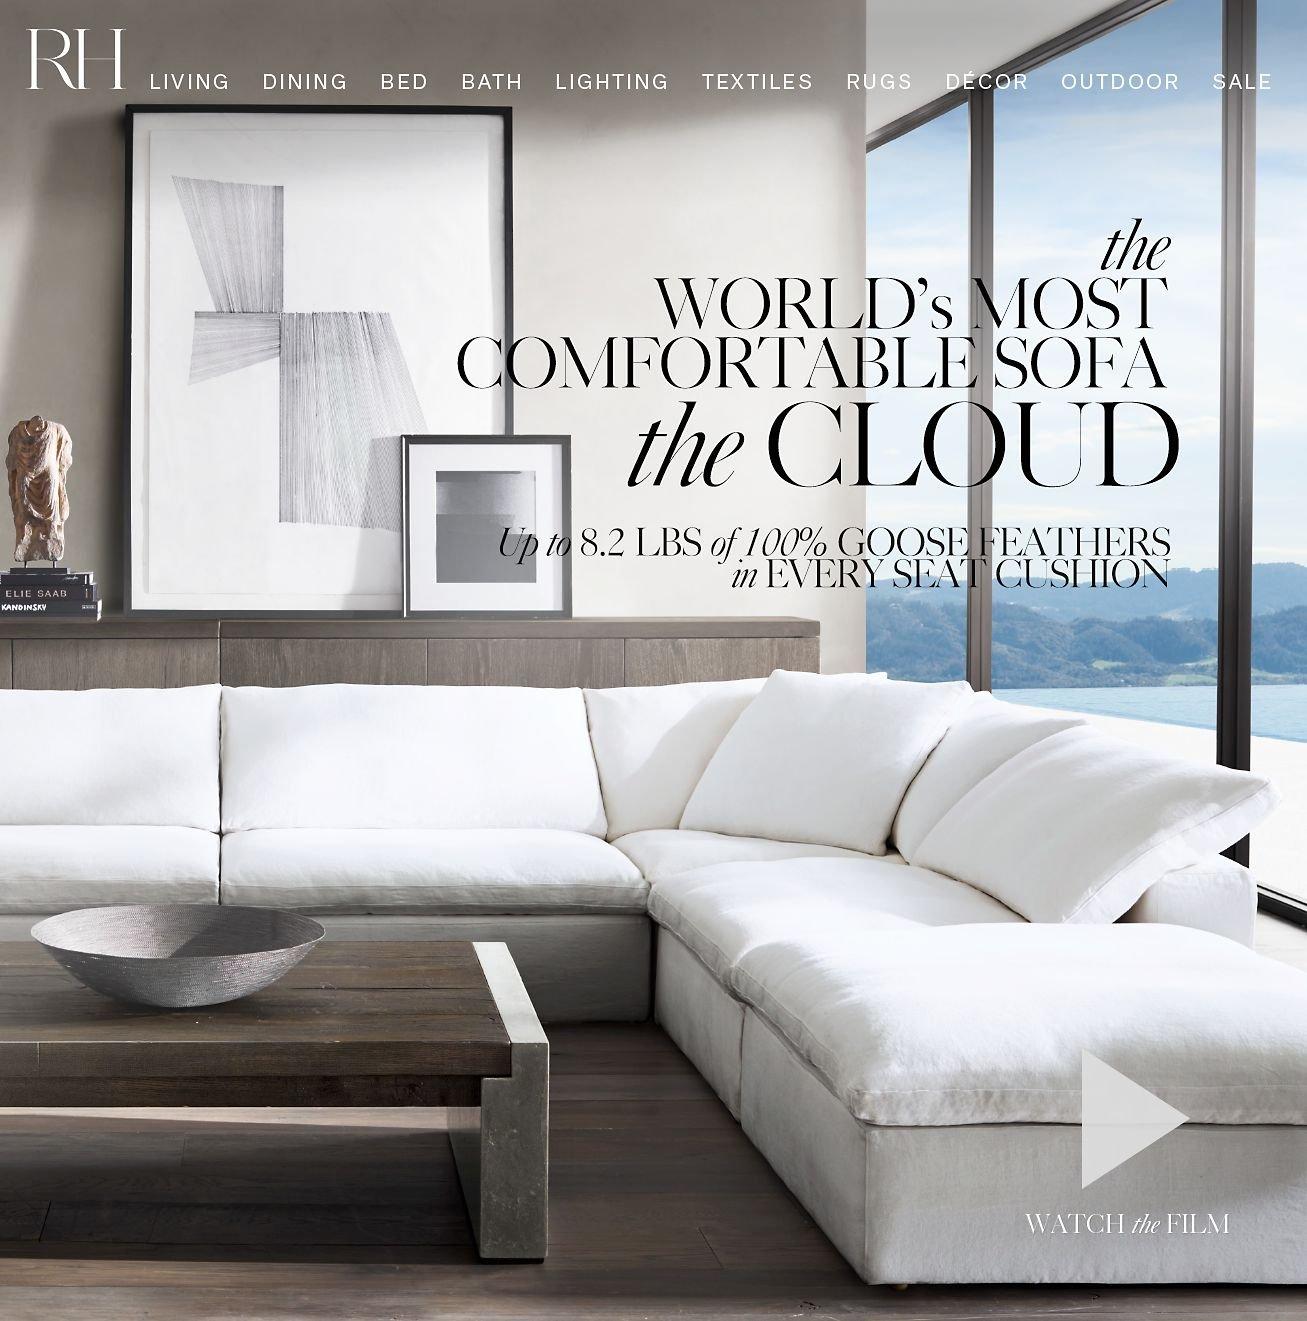 The cloud modular collection